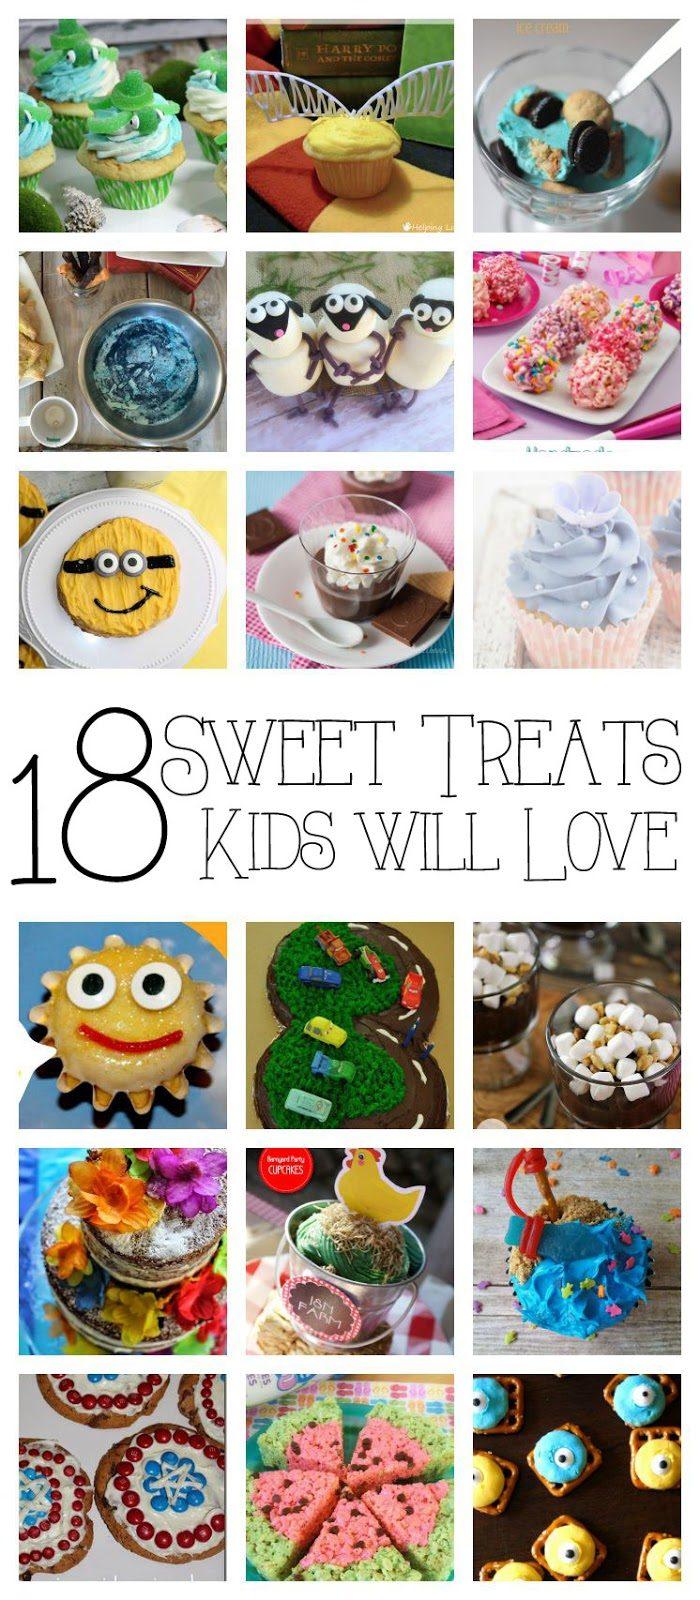 http://makingtheworldcuter.com/wp-content/uploads/2015/07/Kids-Desserts-Collage-700x1600.jpg